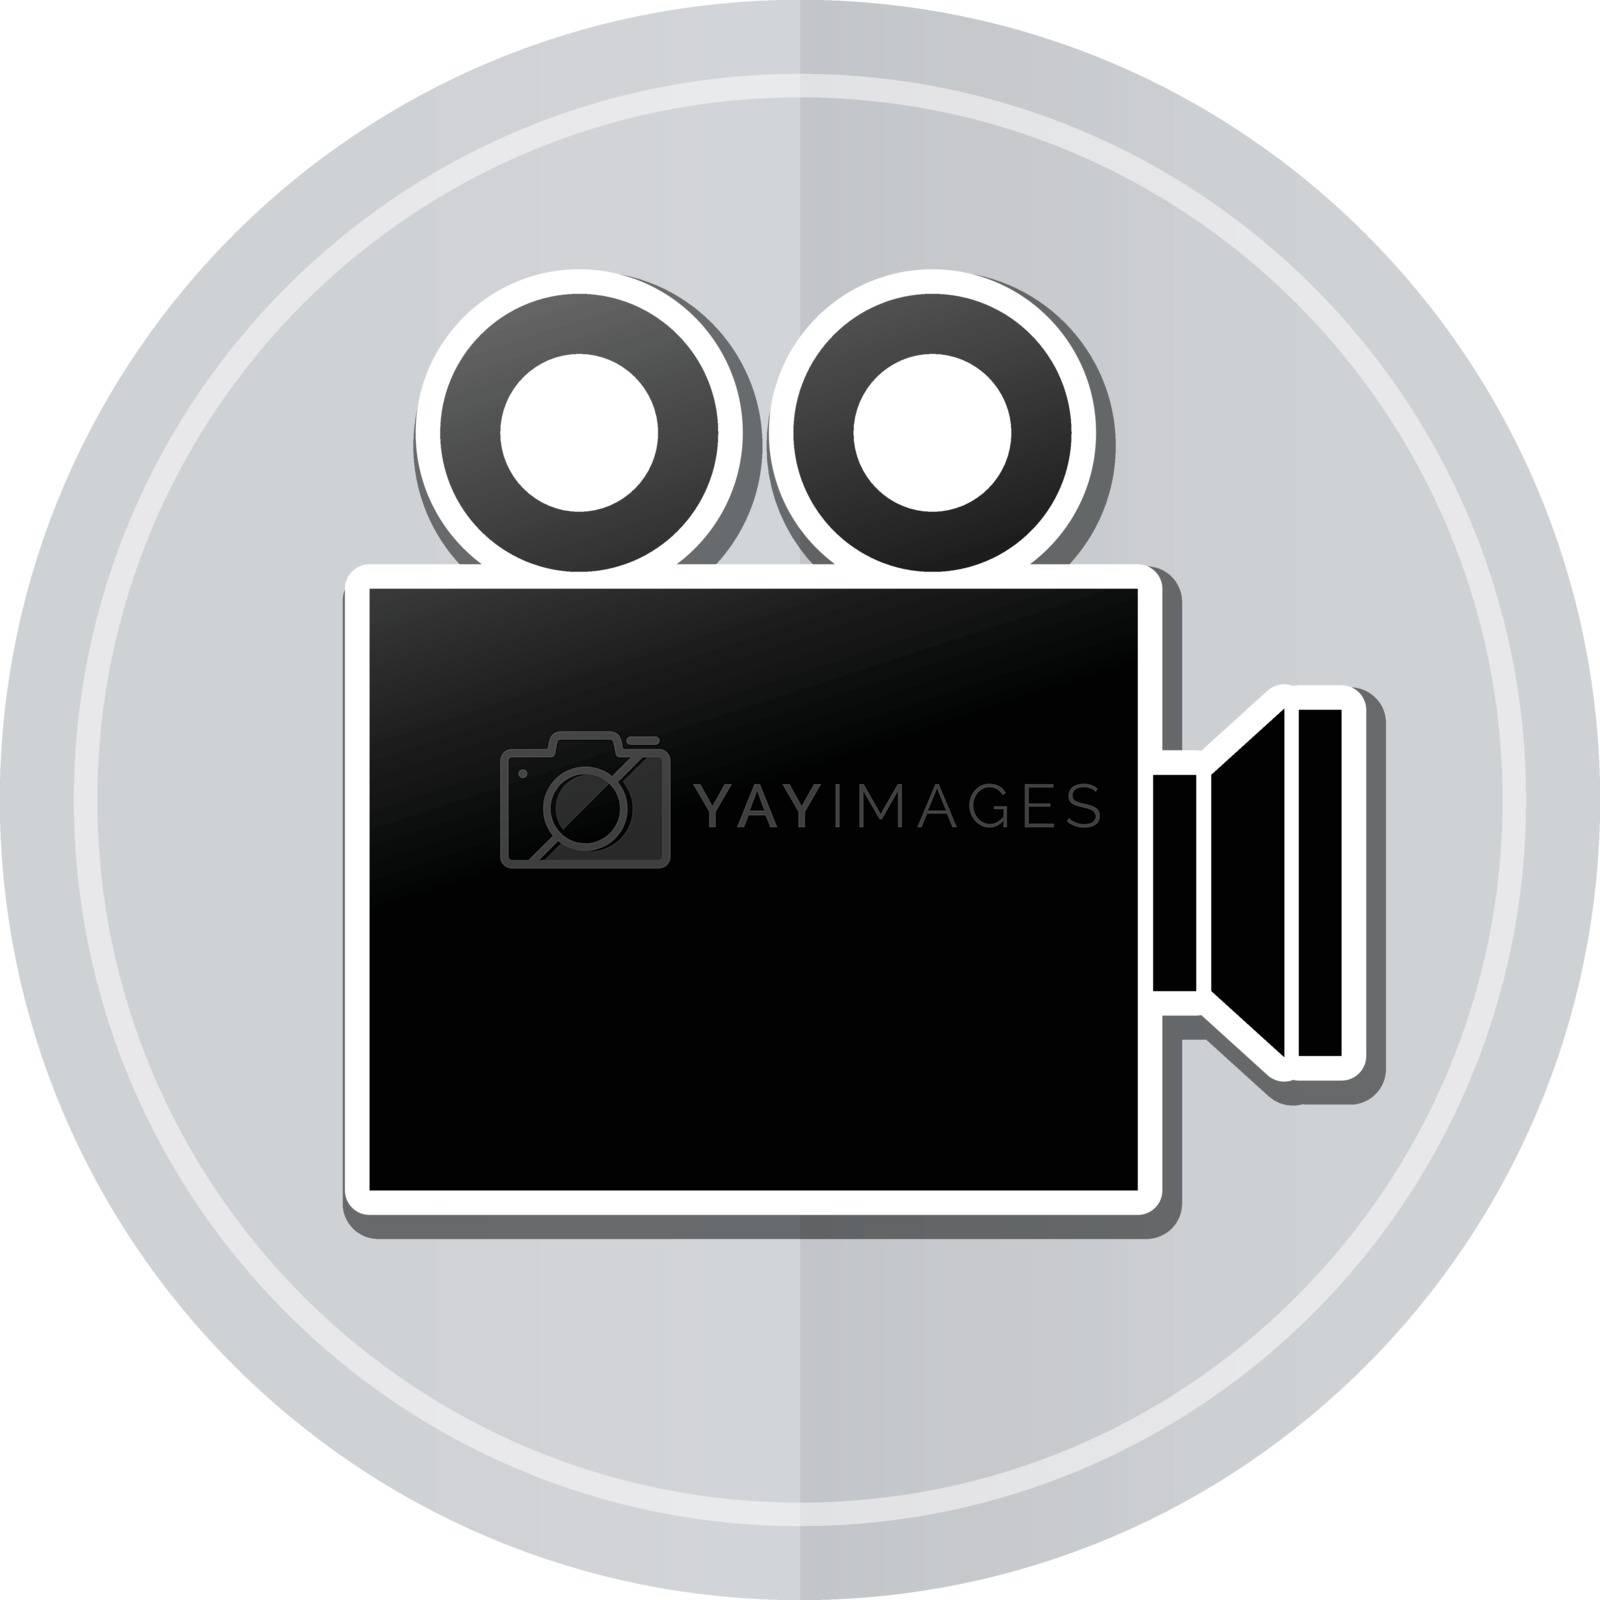 Illustration of cinema sticker icon simple design